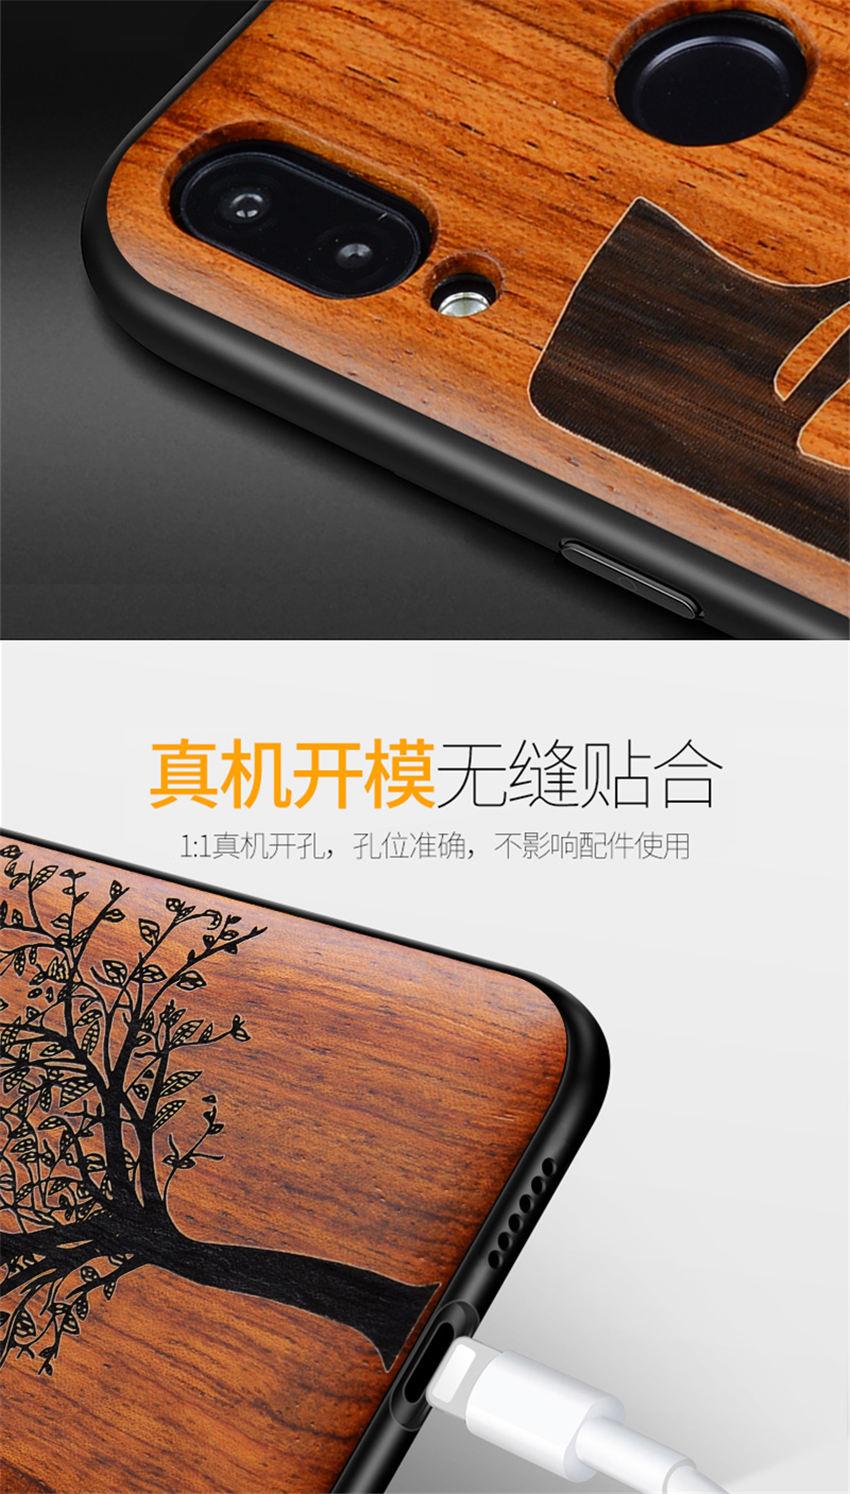 2018 New Huawei Honor 8x Case Slim Wood Back Cover TPU Bumper Case For Huawei Honor 8x Phone Cases Honor-8x (8)